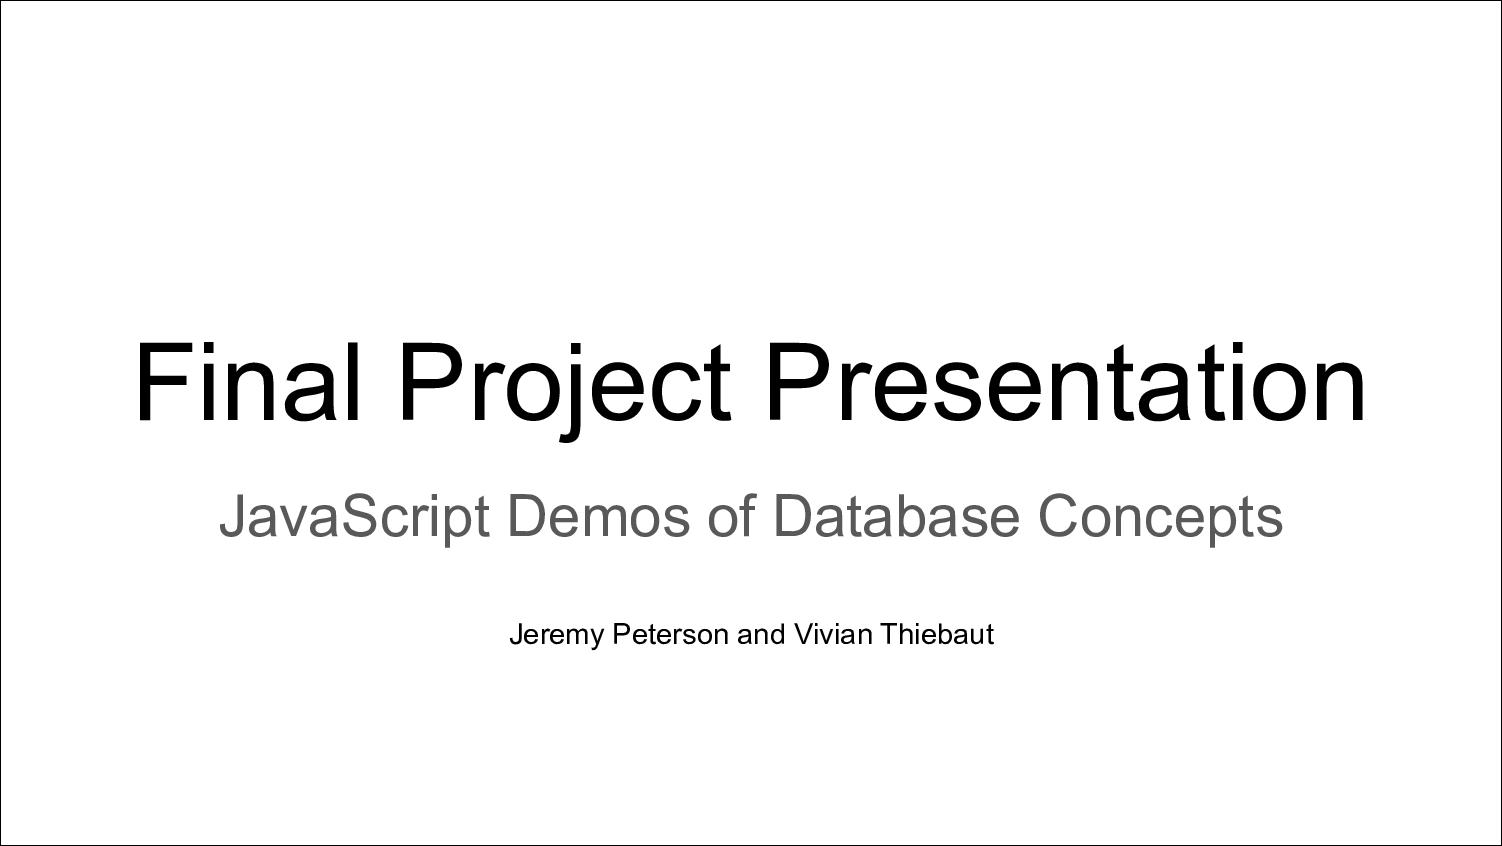 [PRESENTATION] Learning Database Management Protocols via JavaScript Demos